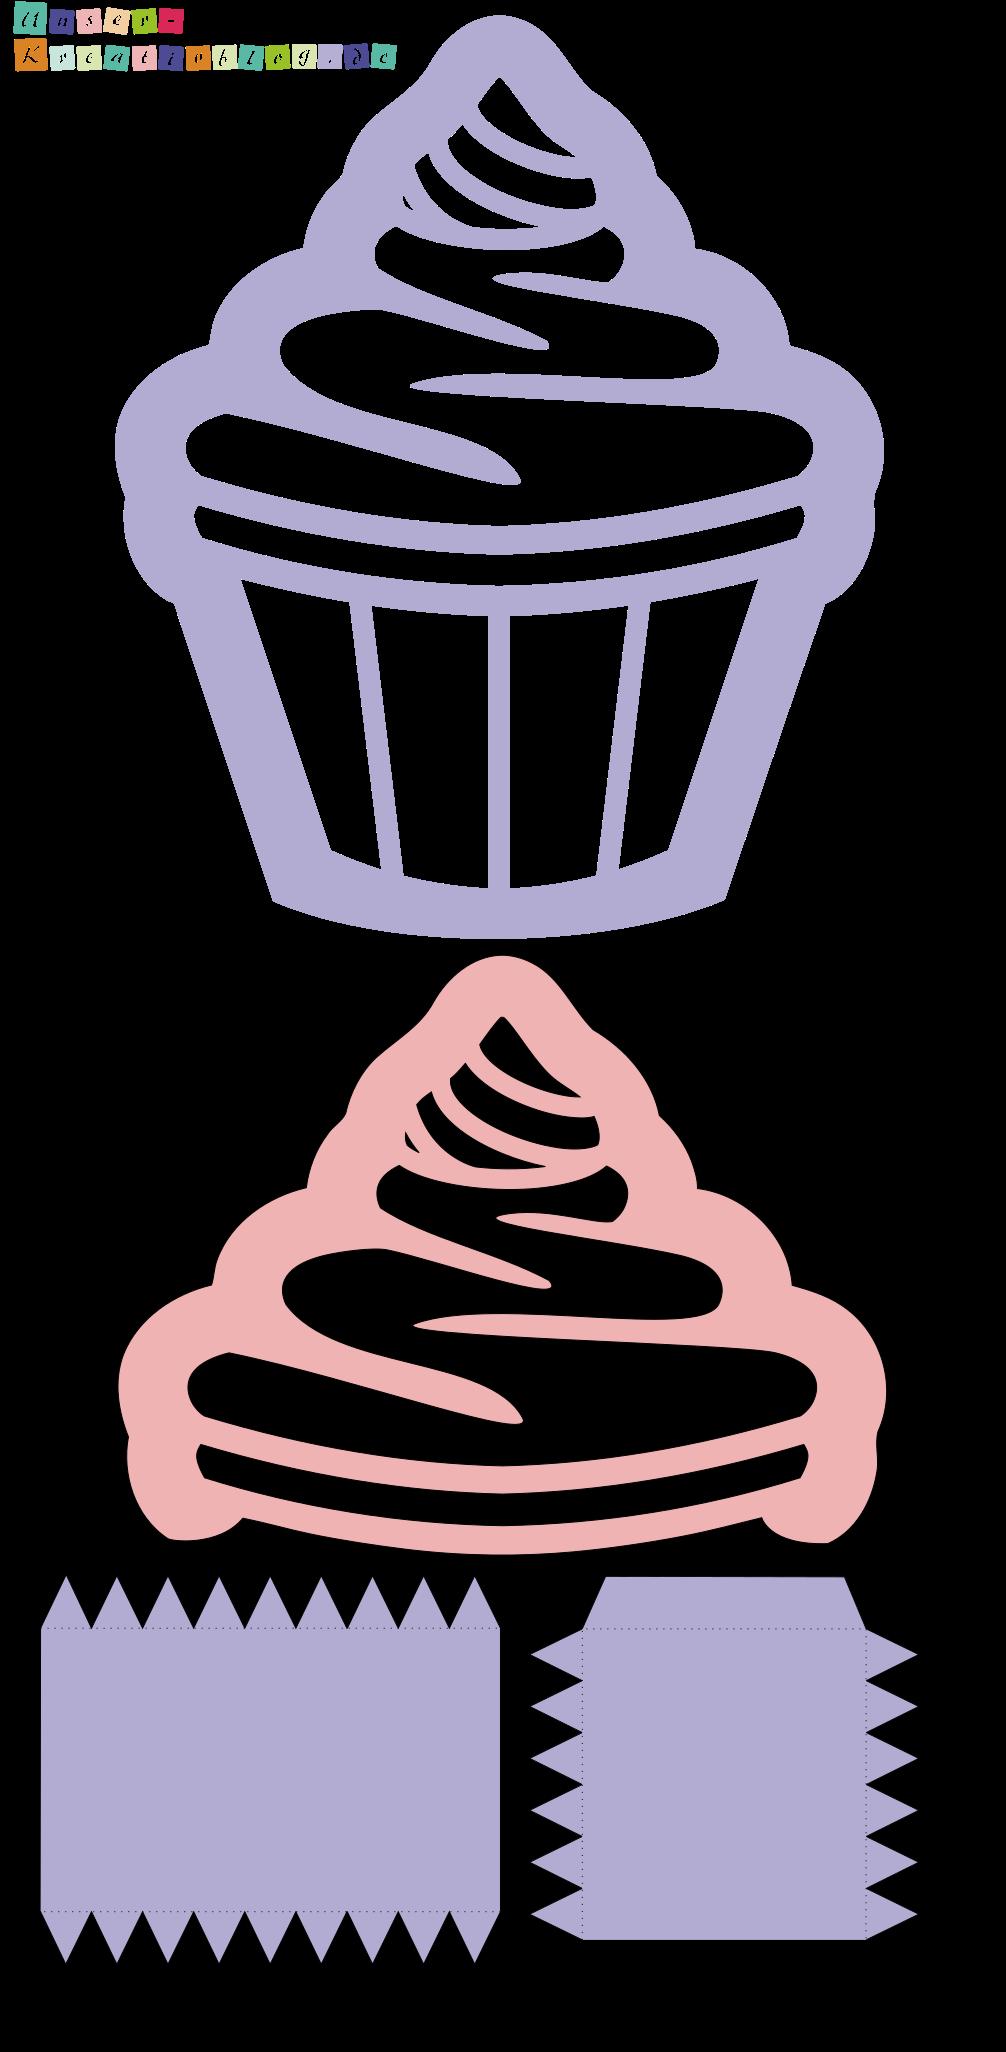 Bastelvorlage Cupcake Laterne Zu St Martin Laterne Basteln Vorlagen Laternen Basteln Basteln